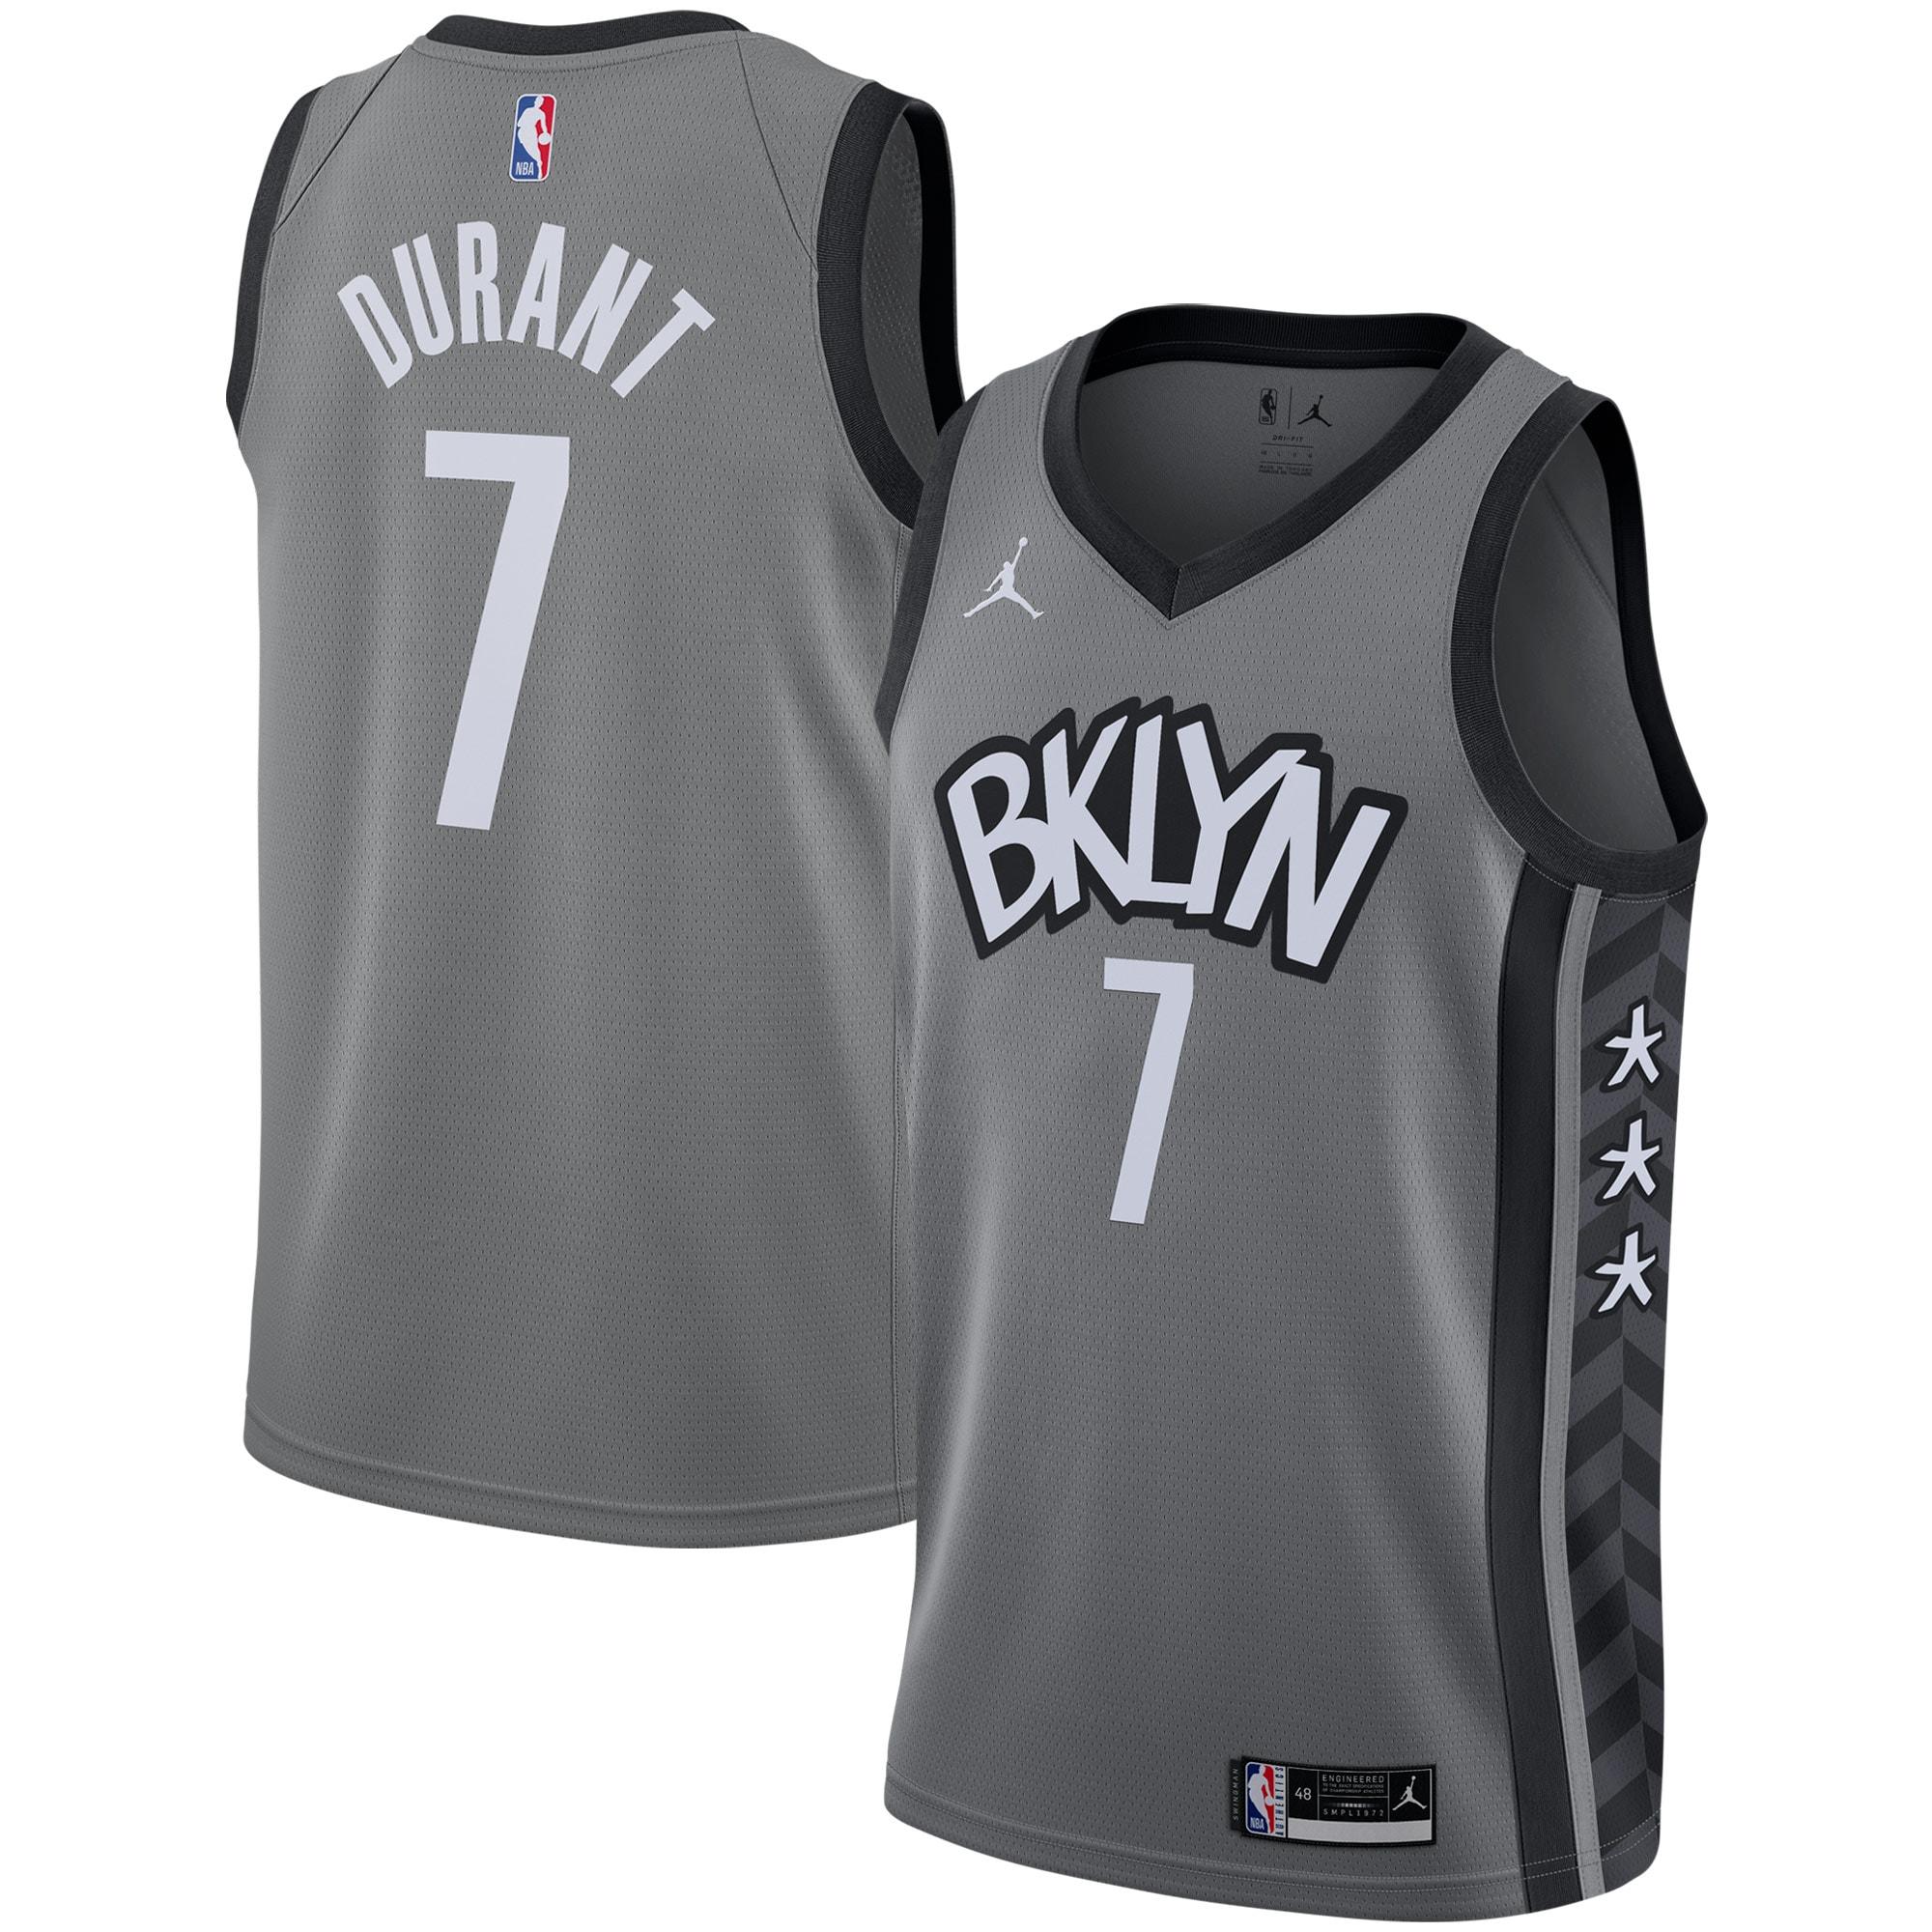 Kevin Durant Brooklyn Nets Jordan Brand 2020/21 Swingman Jersey - Statement Edition - Gray